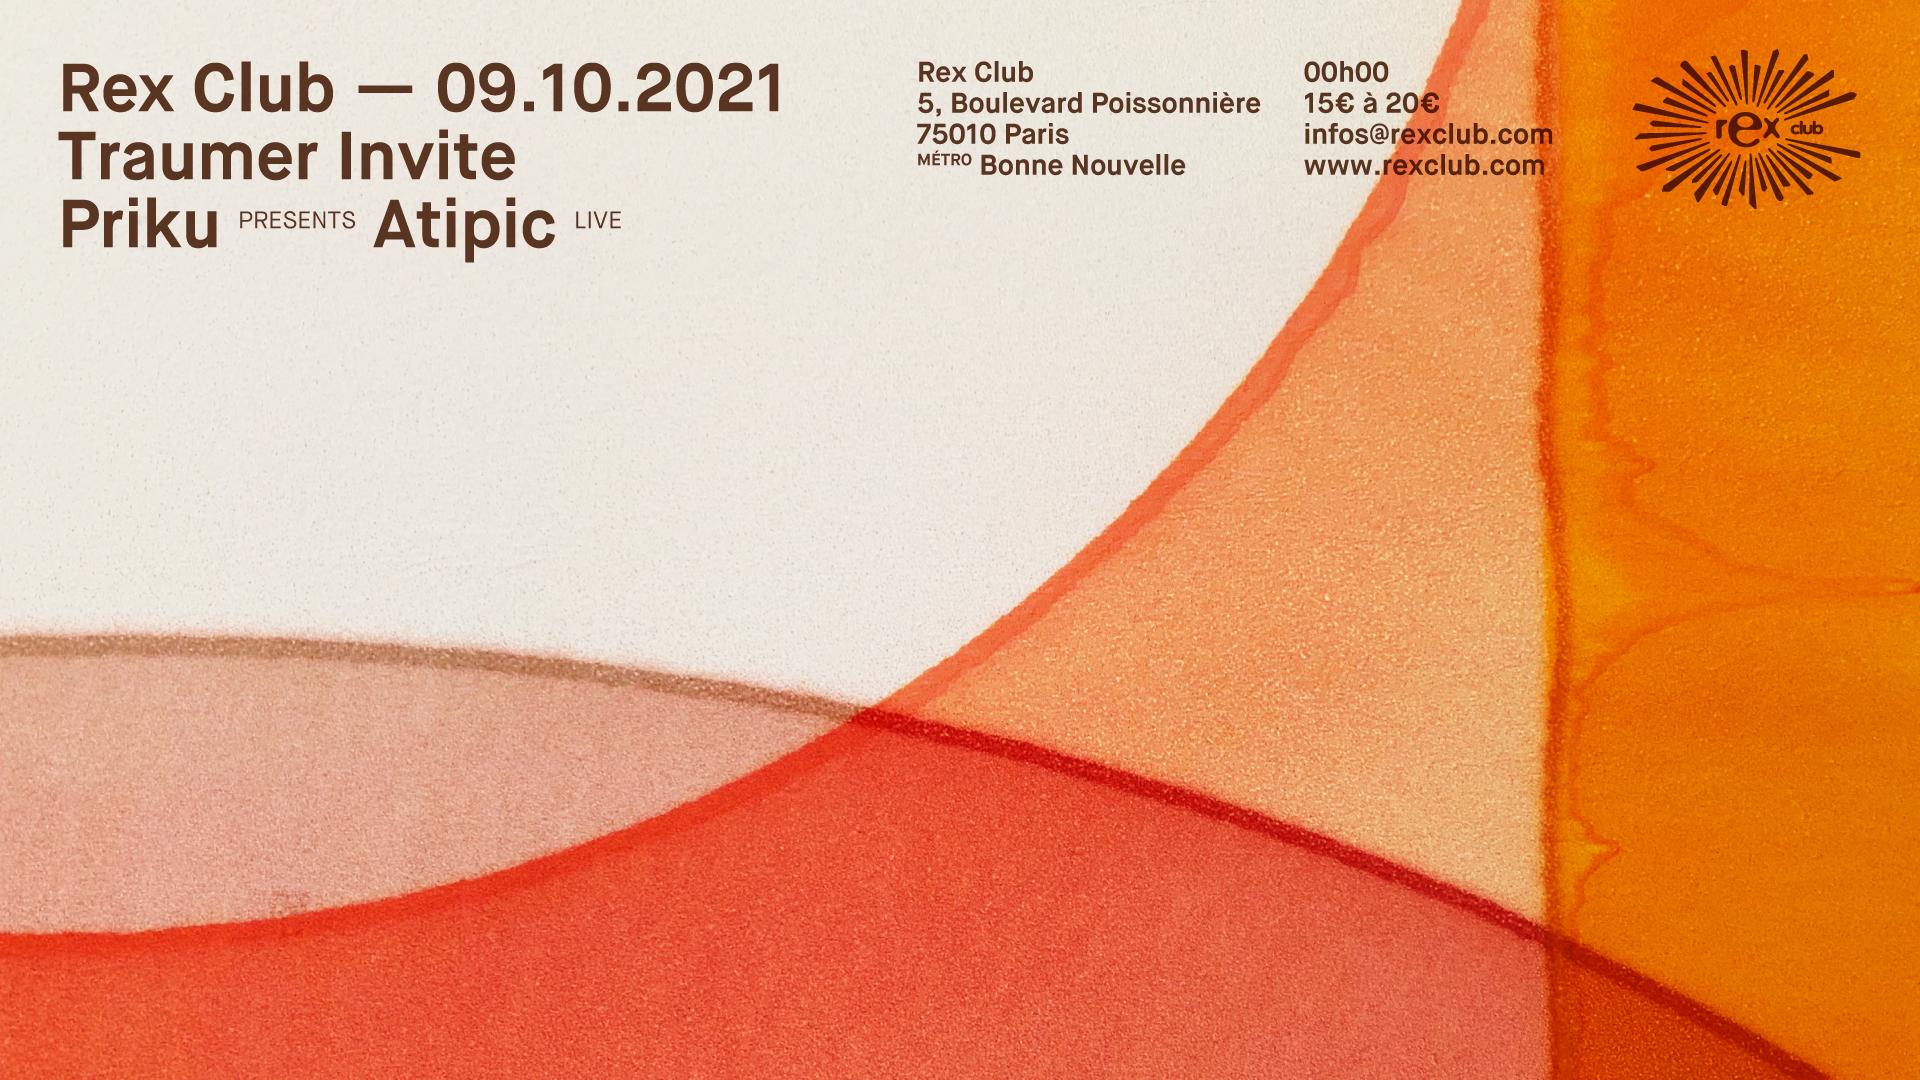 Traumer Invite Priku Presents Atipic Live